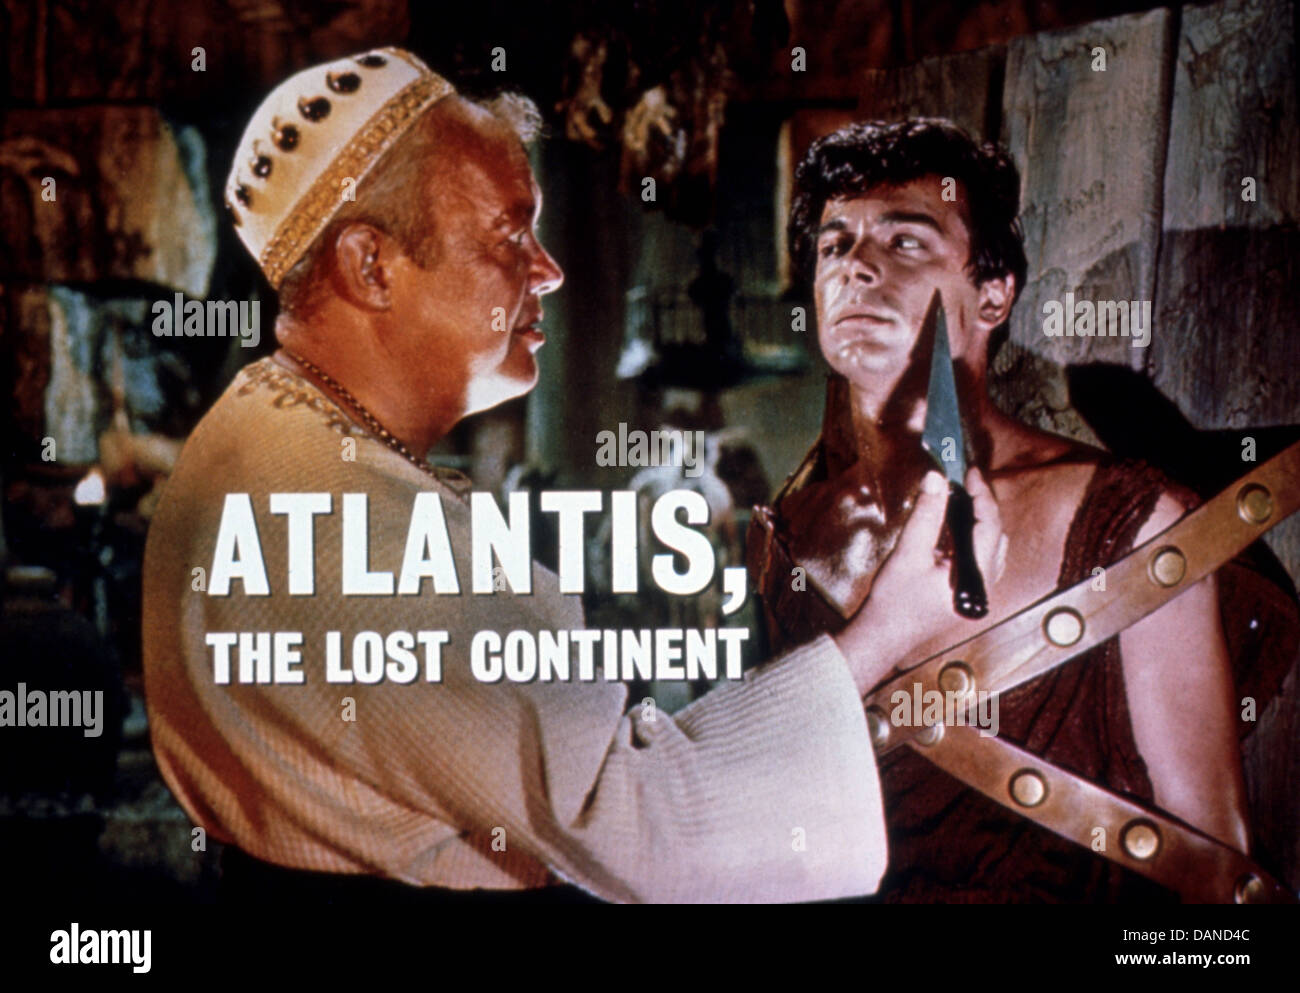 ATLANTIS, DER VERLORENE KONTINENT (1961), EDGAR STEHLI, ANTHONY HALL, GEORGE PAL (DIR) ALCO 001 MOVIESTORE SAMMLUNG Stockbild